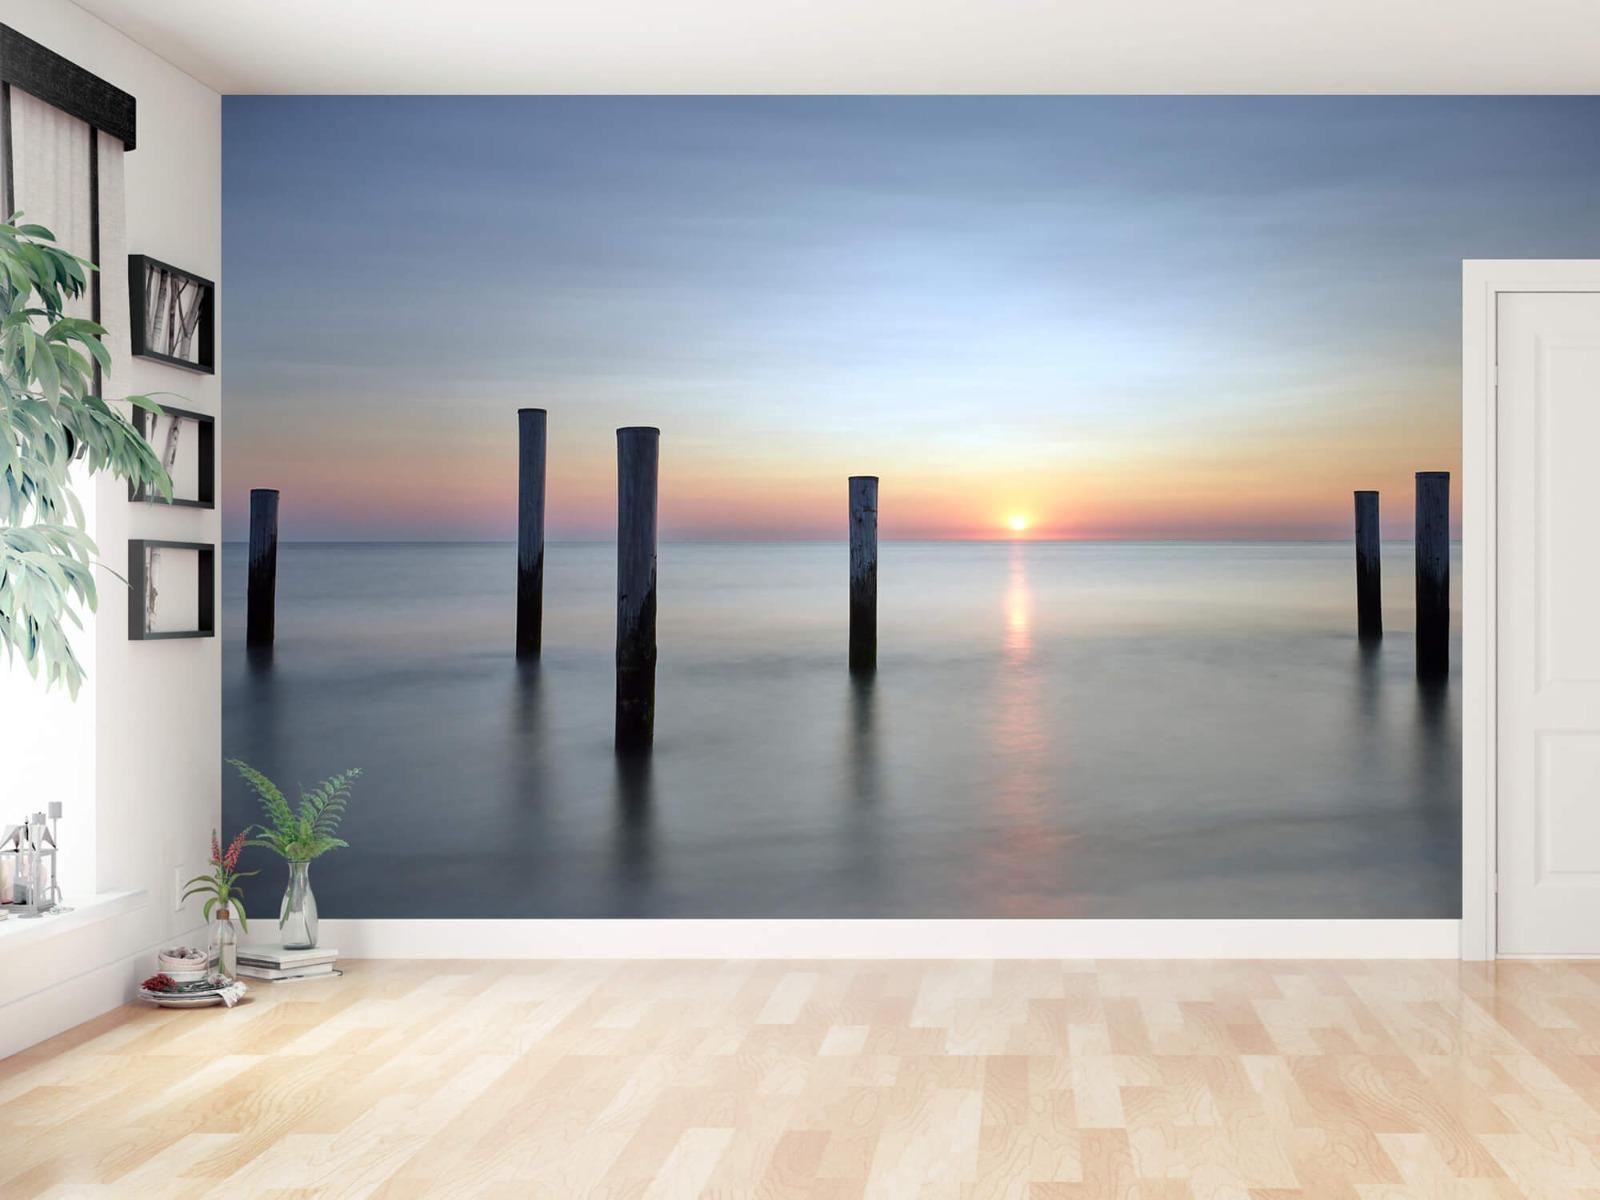 Zeeën en Oceanen - Strandpalen - Slaapkamer 16